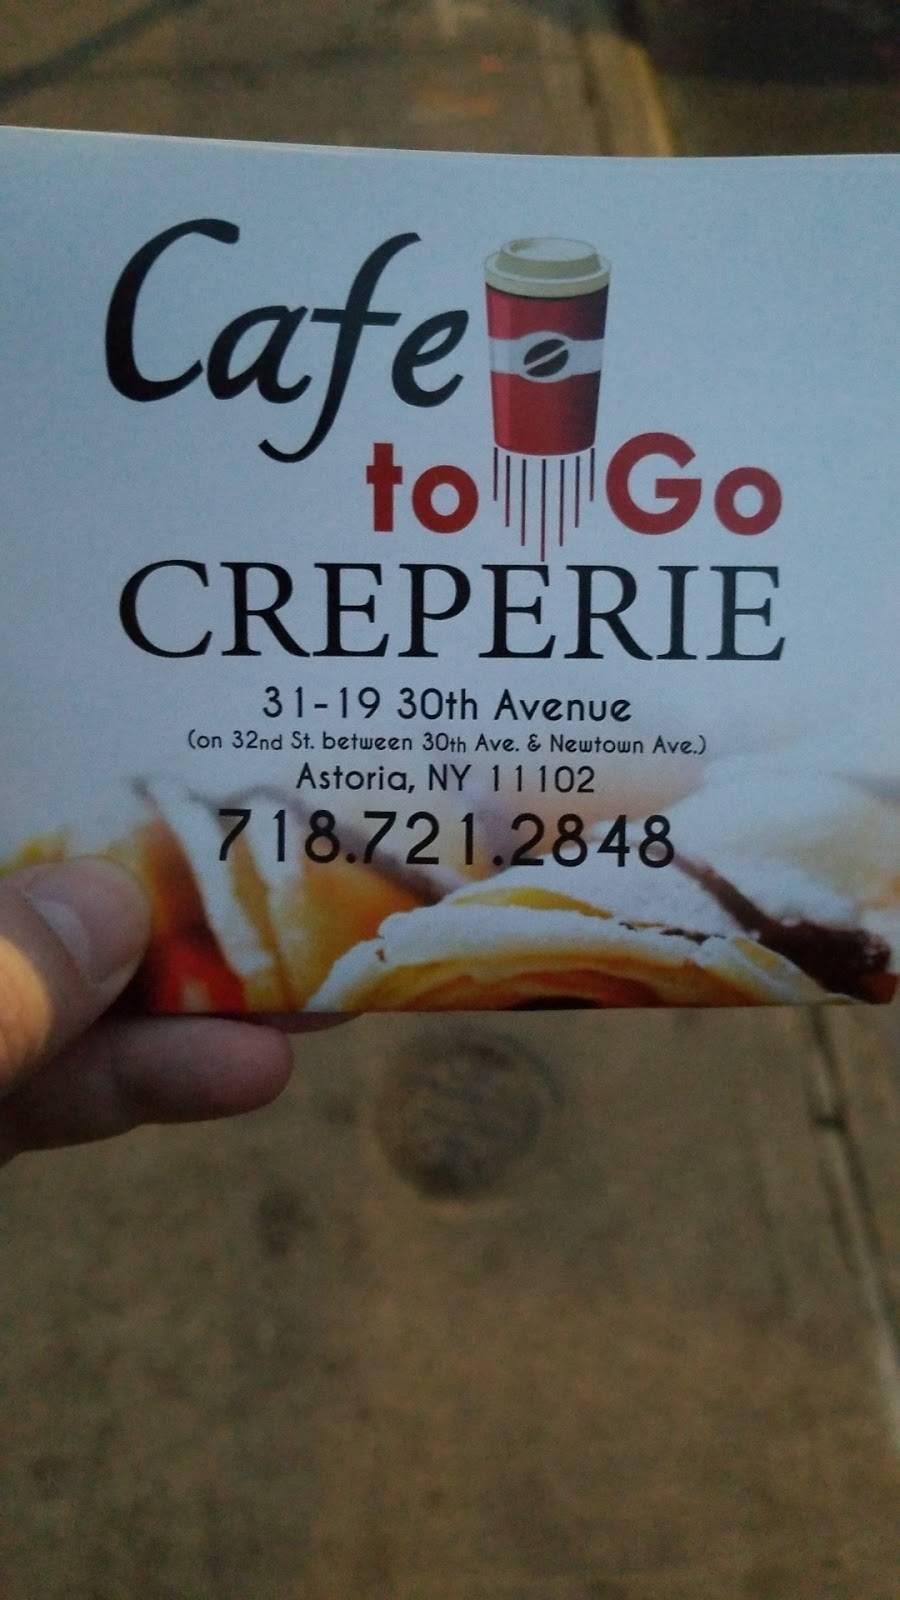 Cafe to Go | cafe | 31-19 30th Ave, Astoria, NY 11102, USA | 7187212848 OR +1 718-721-2848